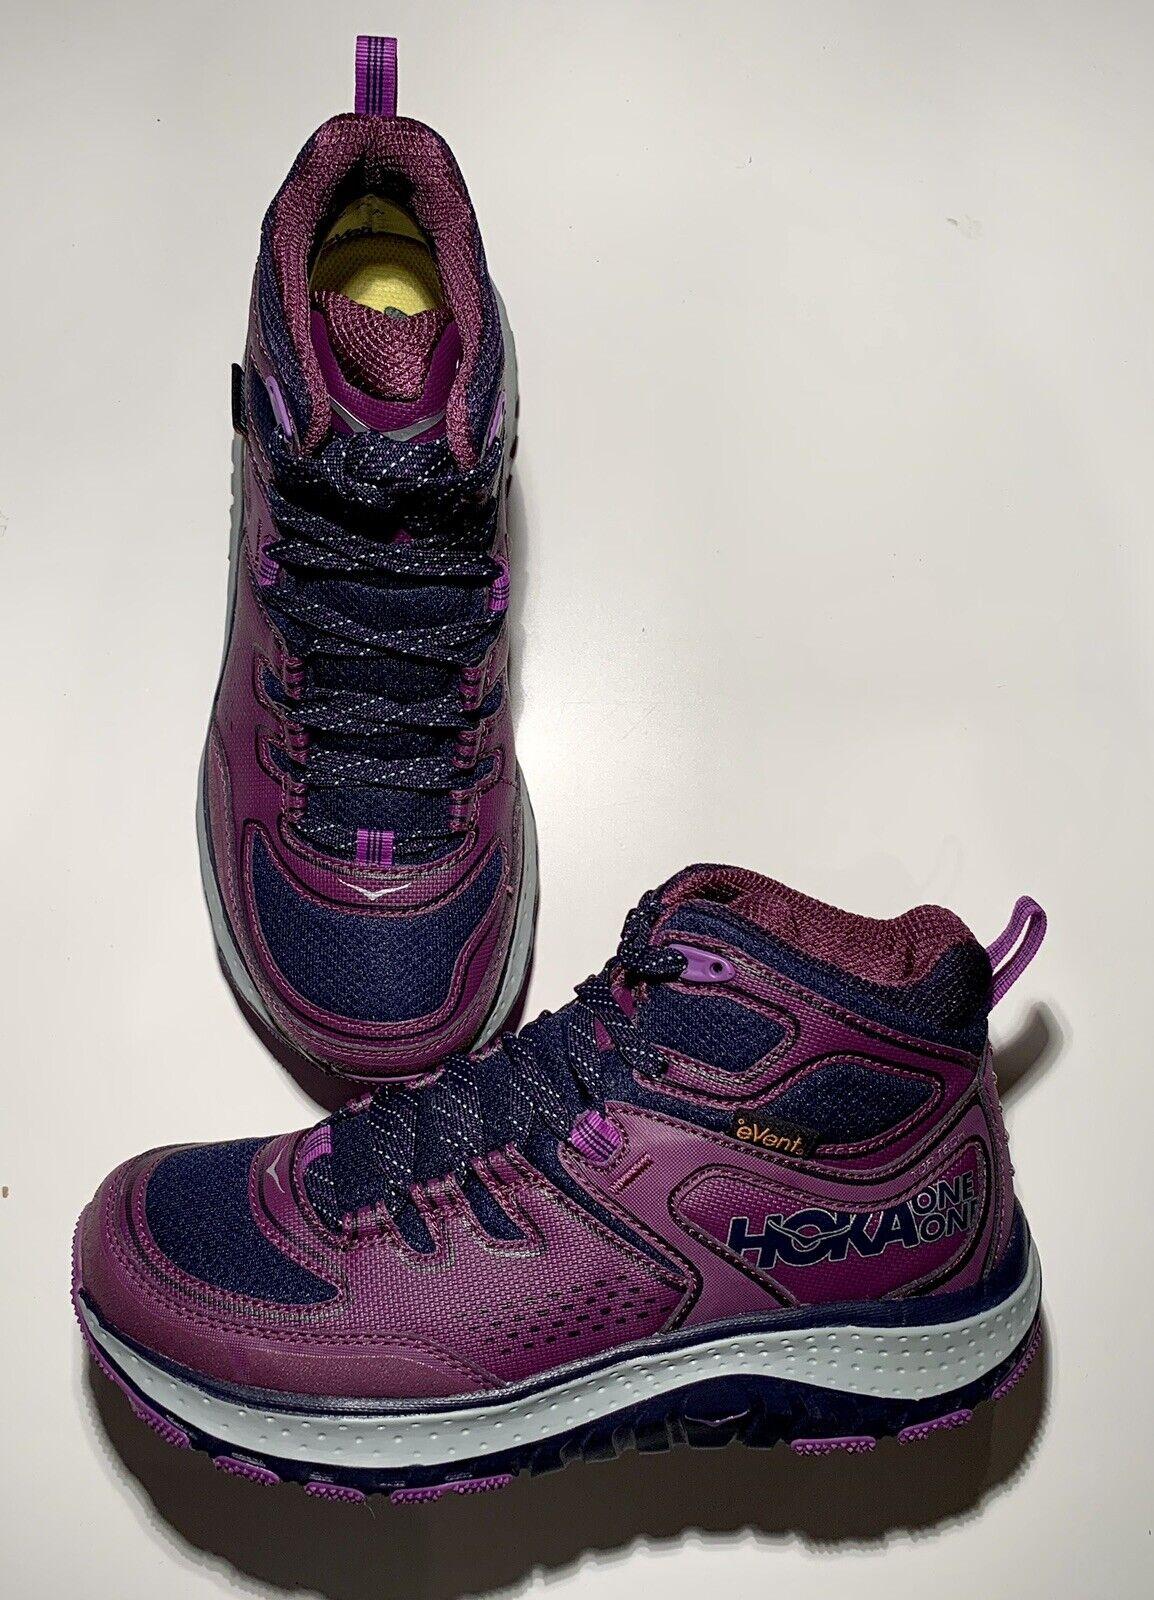 Hoka One One Tor Tech Mid WP Chaquetón Plum Senderismo Zapatos Para mujeres EE. UU. 7 Nuevo Sin Caja B3